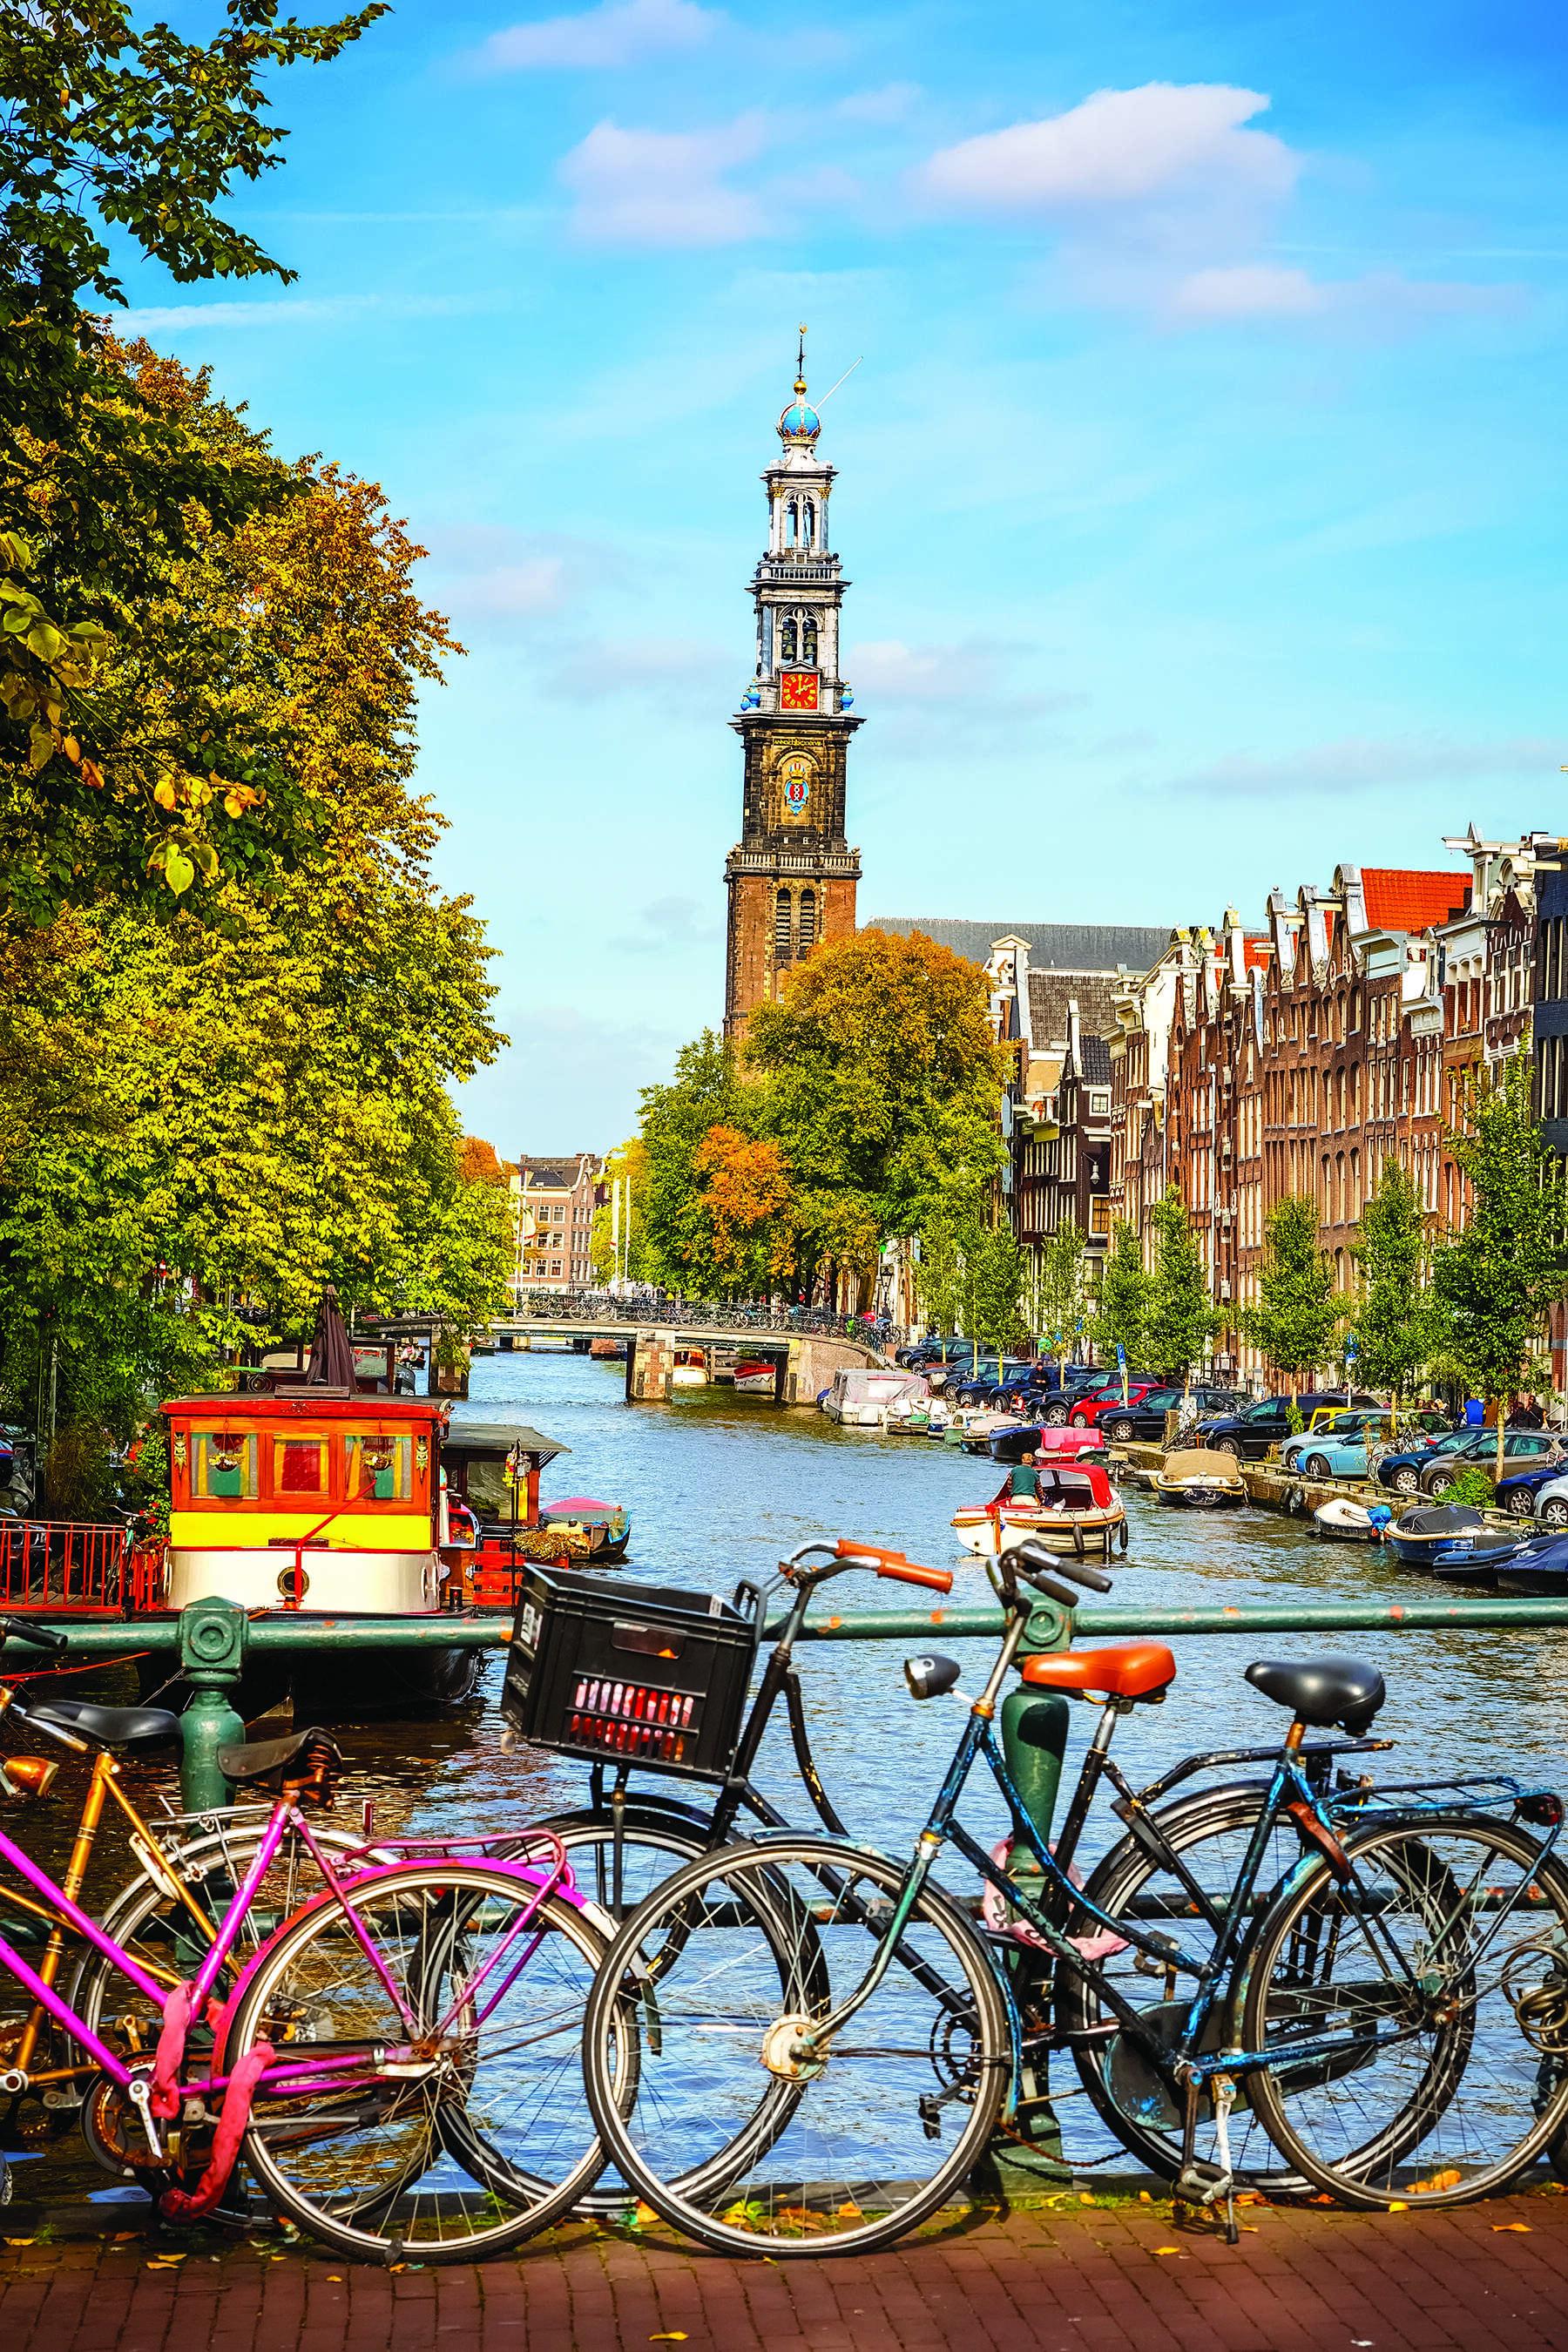 Netherlands, Belgium & France